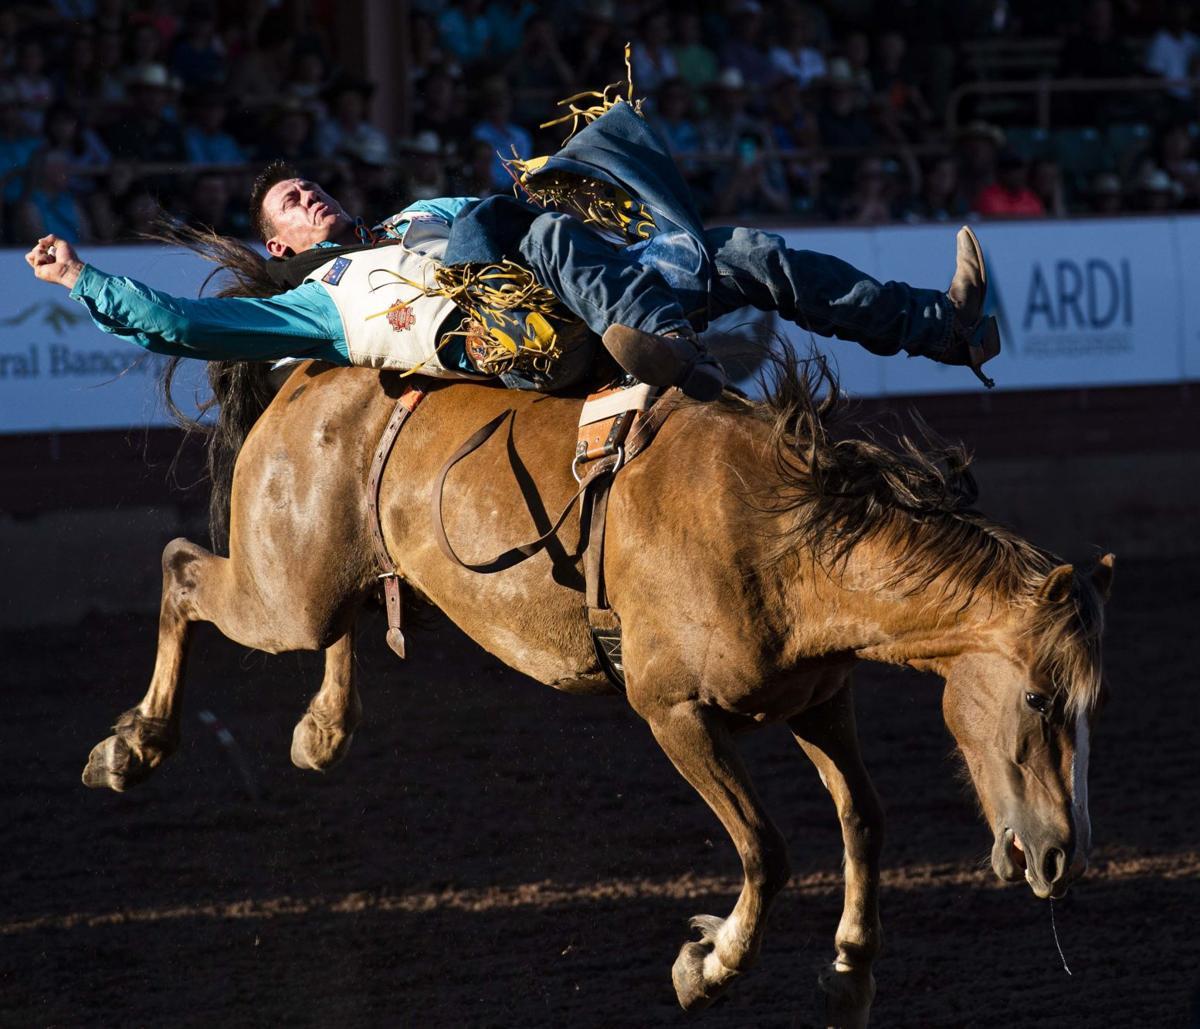 07_10_19 rodeo 0655.jpg